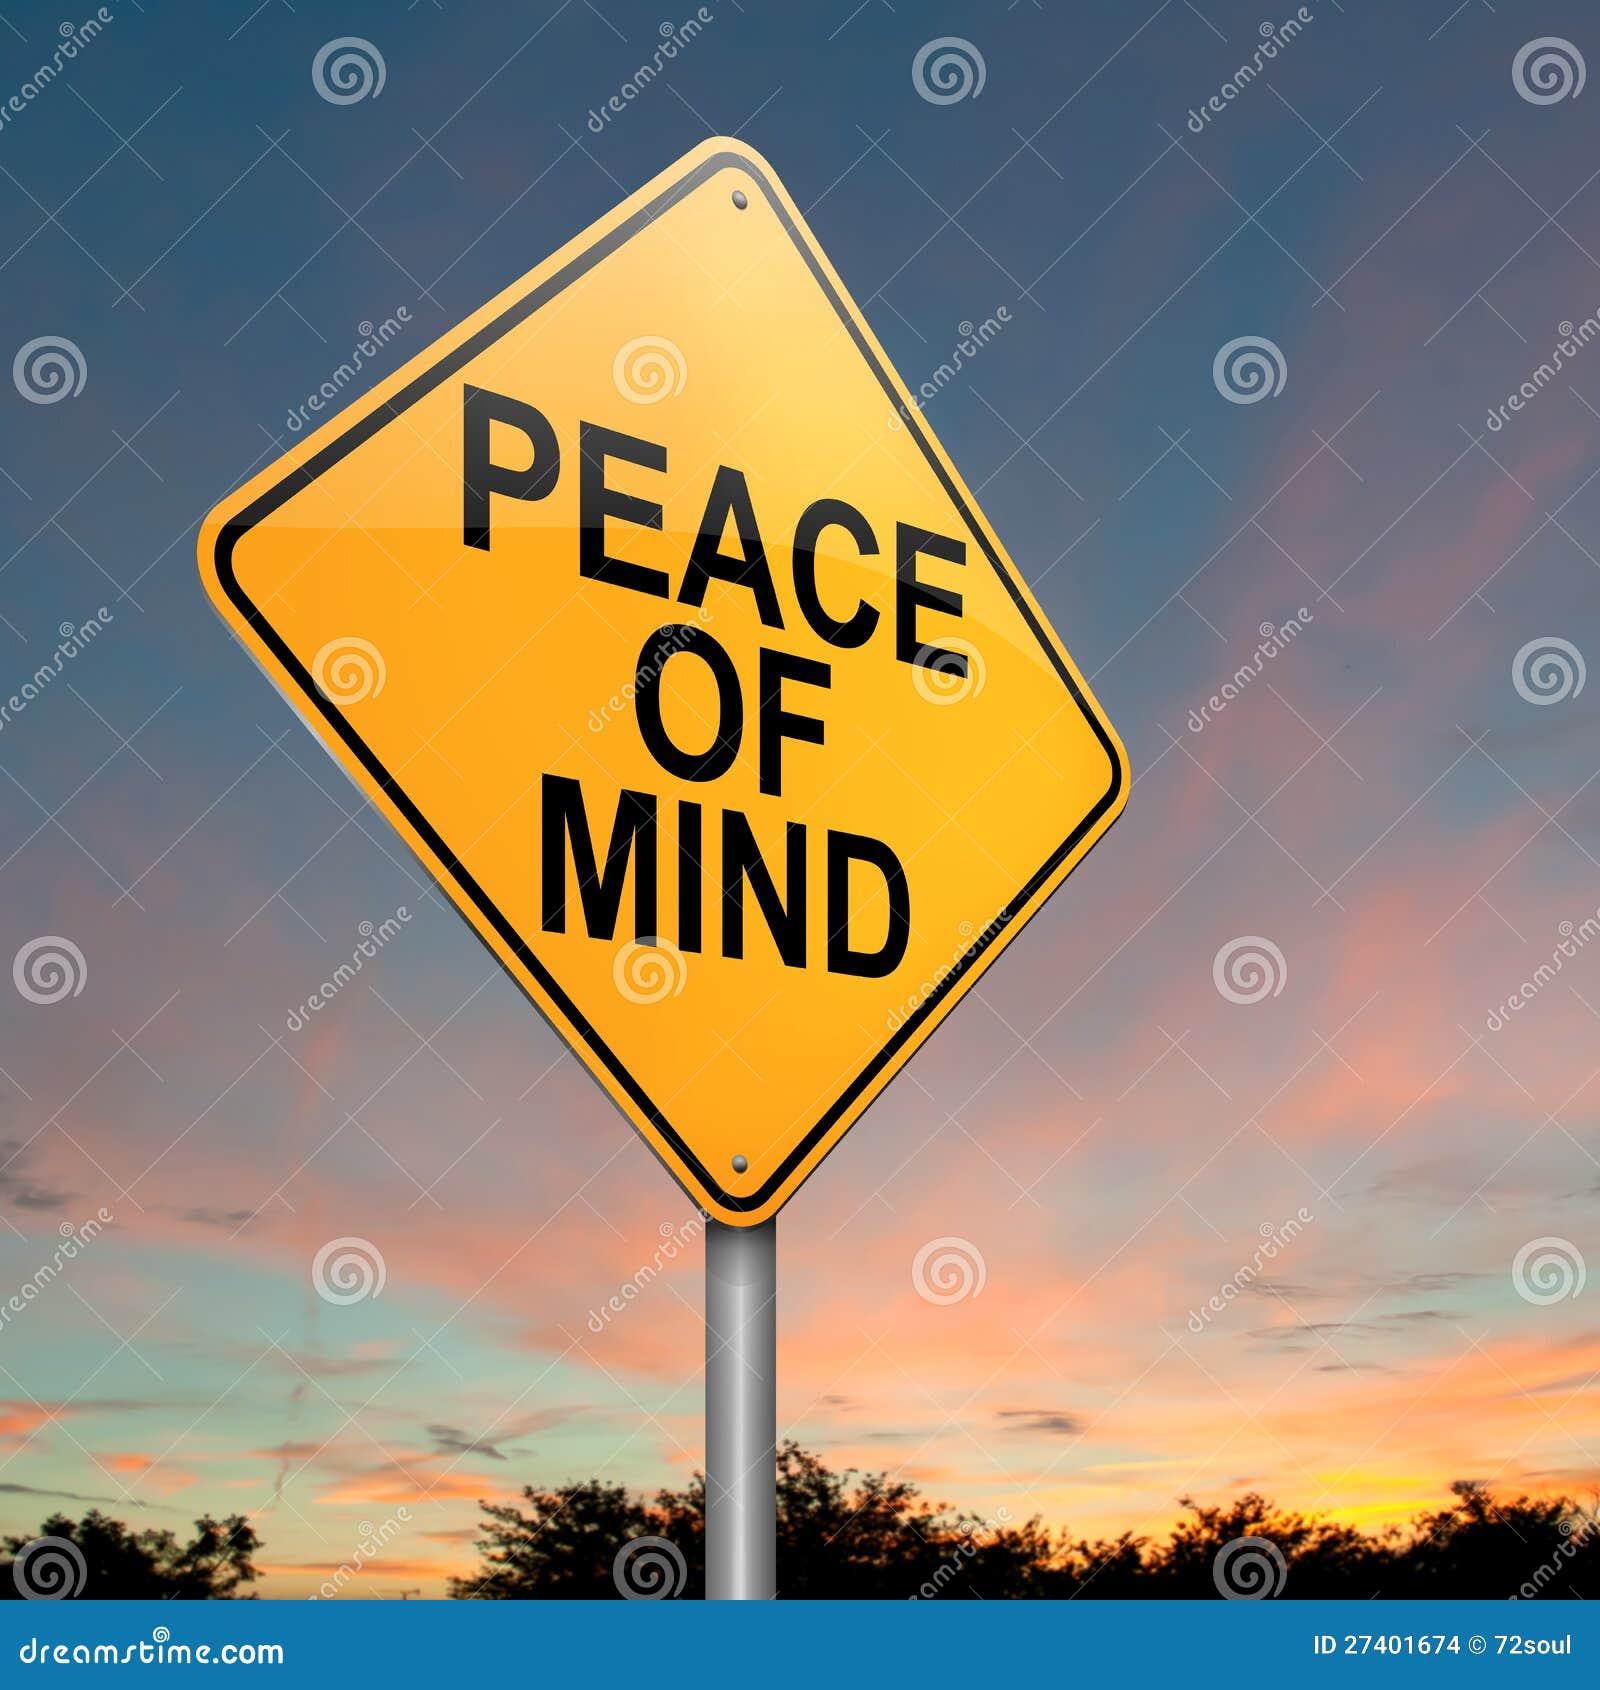 Peace of mind.